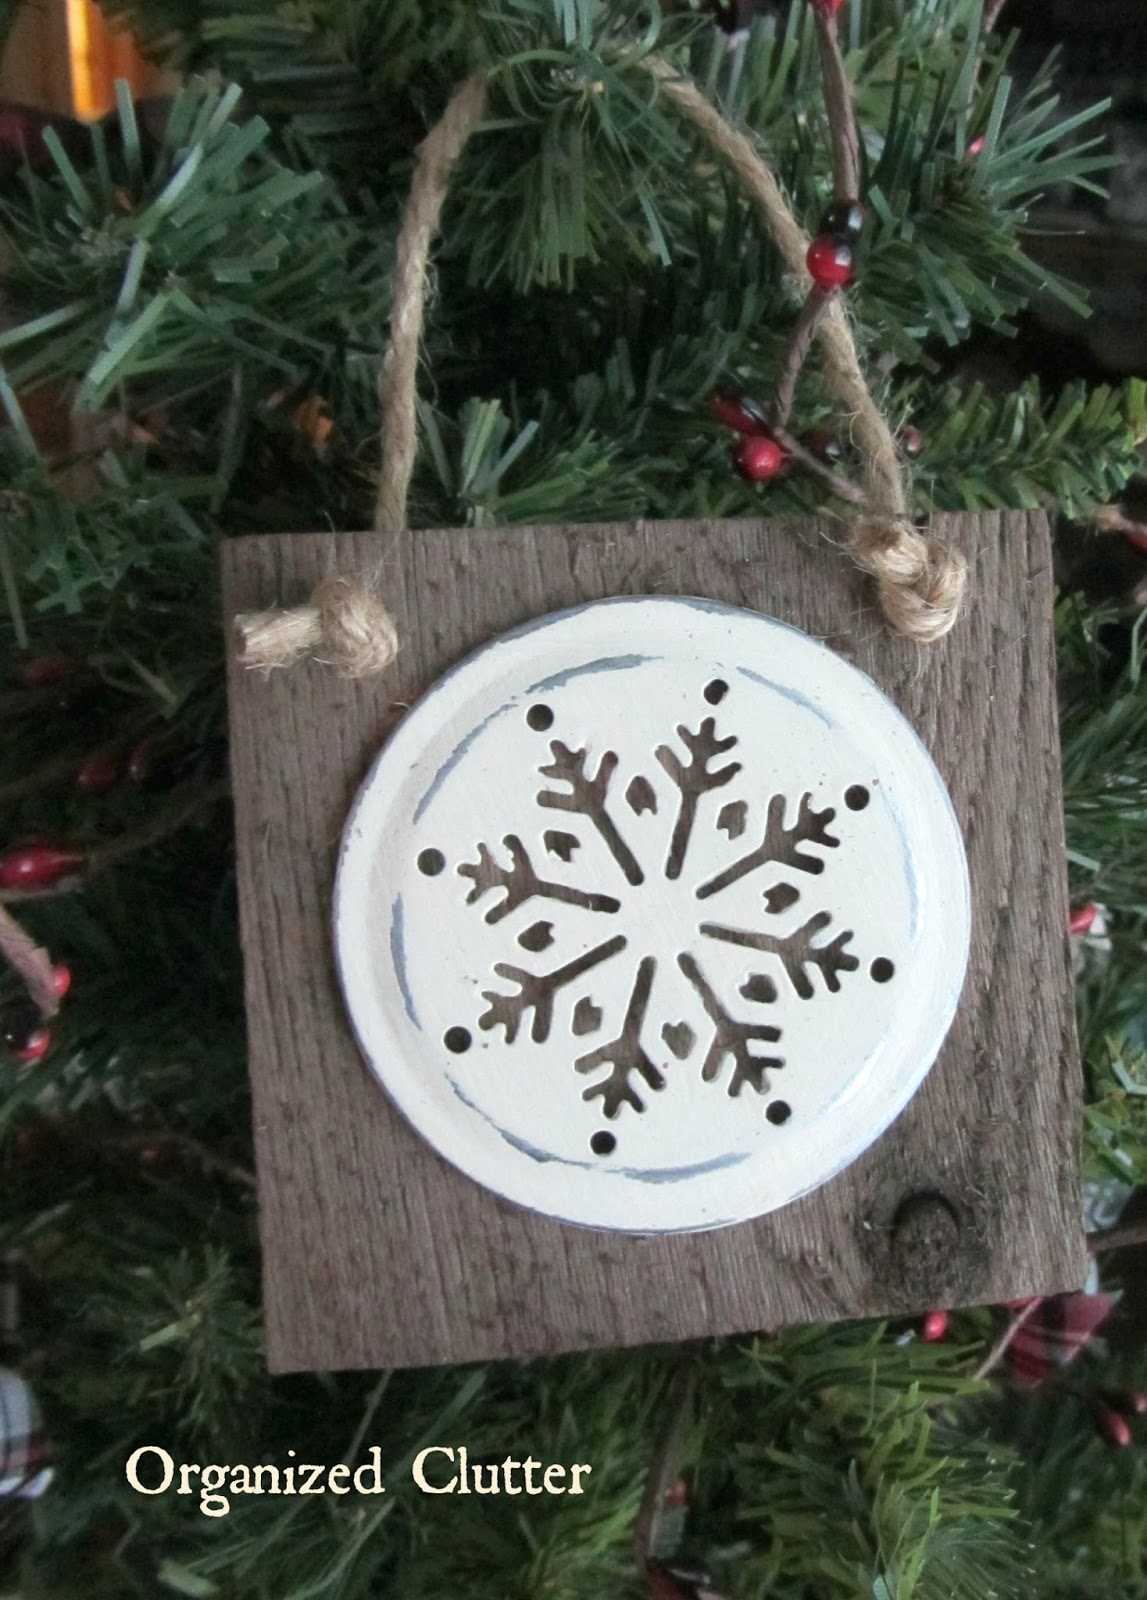 Barn Wood Snowflake Ornaments www.organizedclutterqueen.blogspot.com